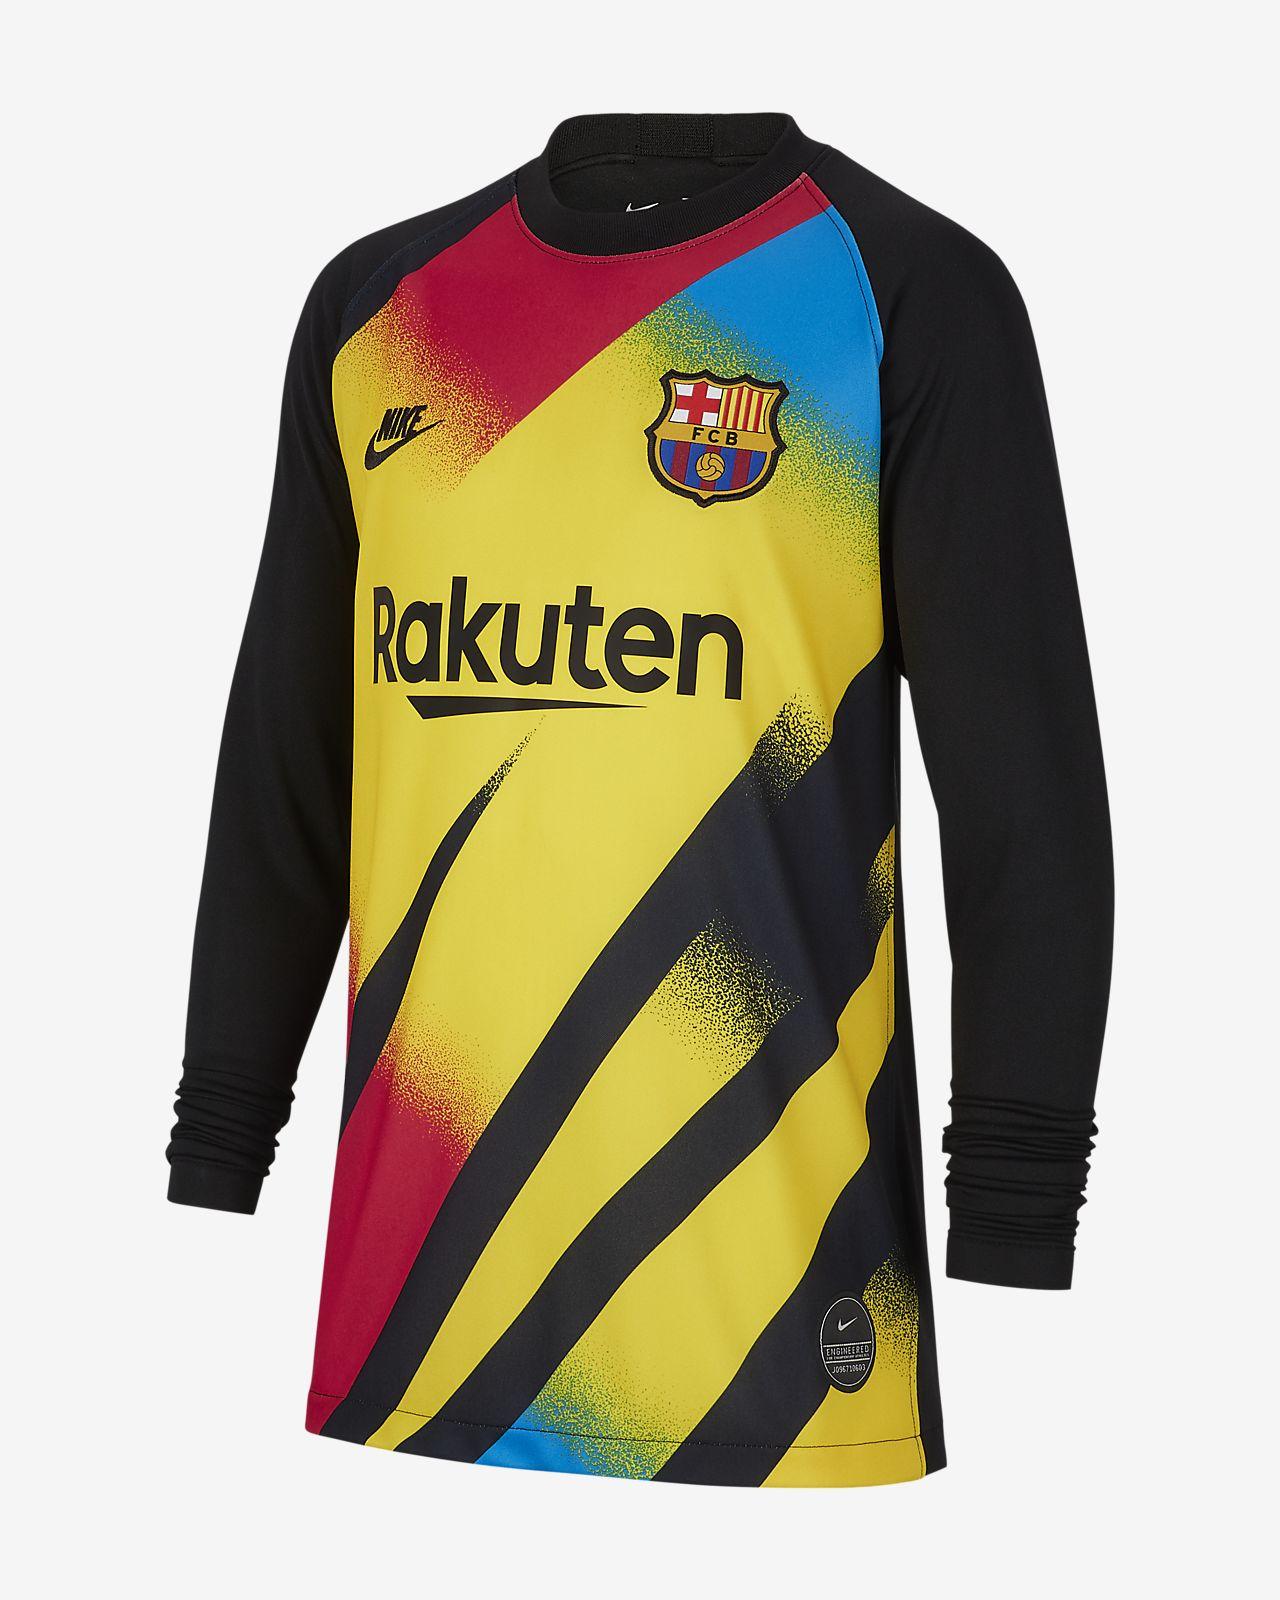 brand new 119bf ecc1a FC Barcelona 2019/20 Stadium Goalkeeper Older Kids' Football Shirt